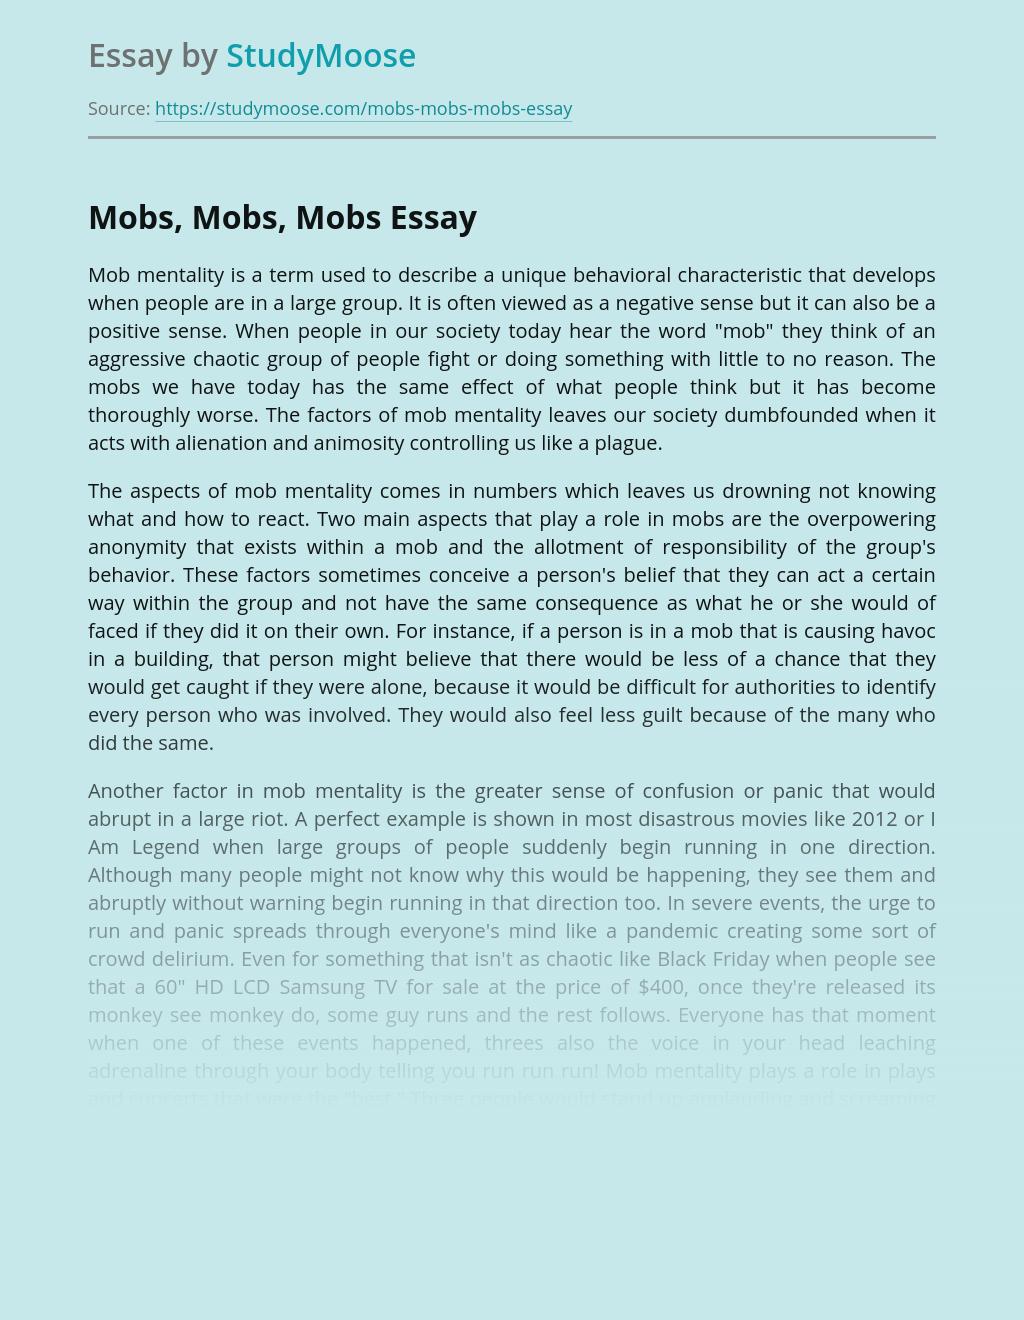 Mobs, Mobs, Mobs